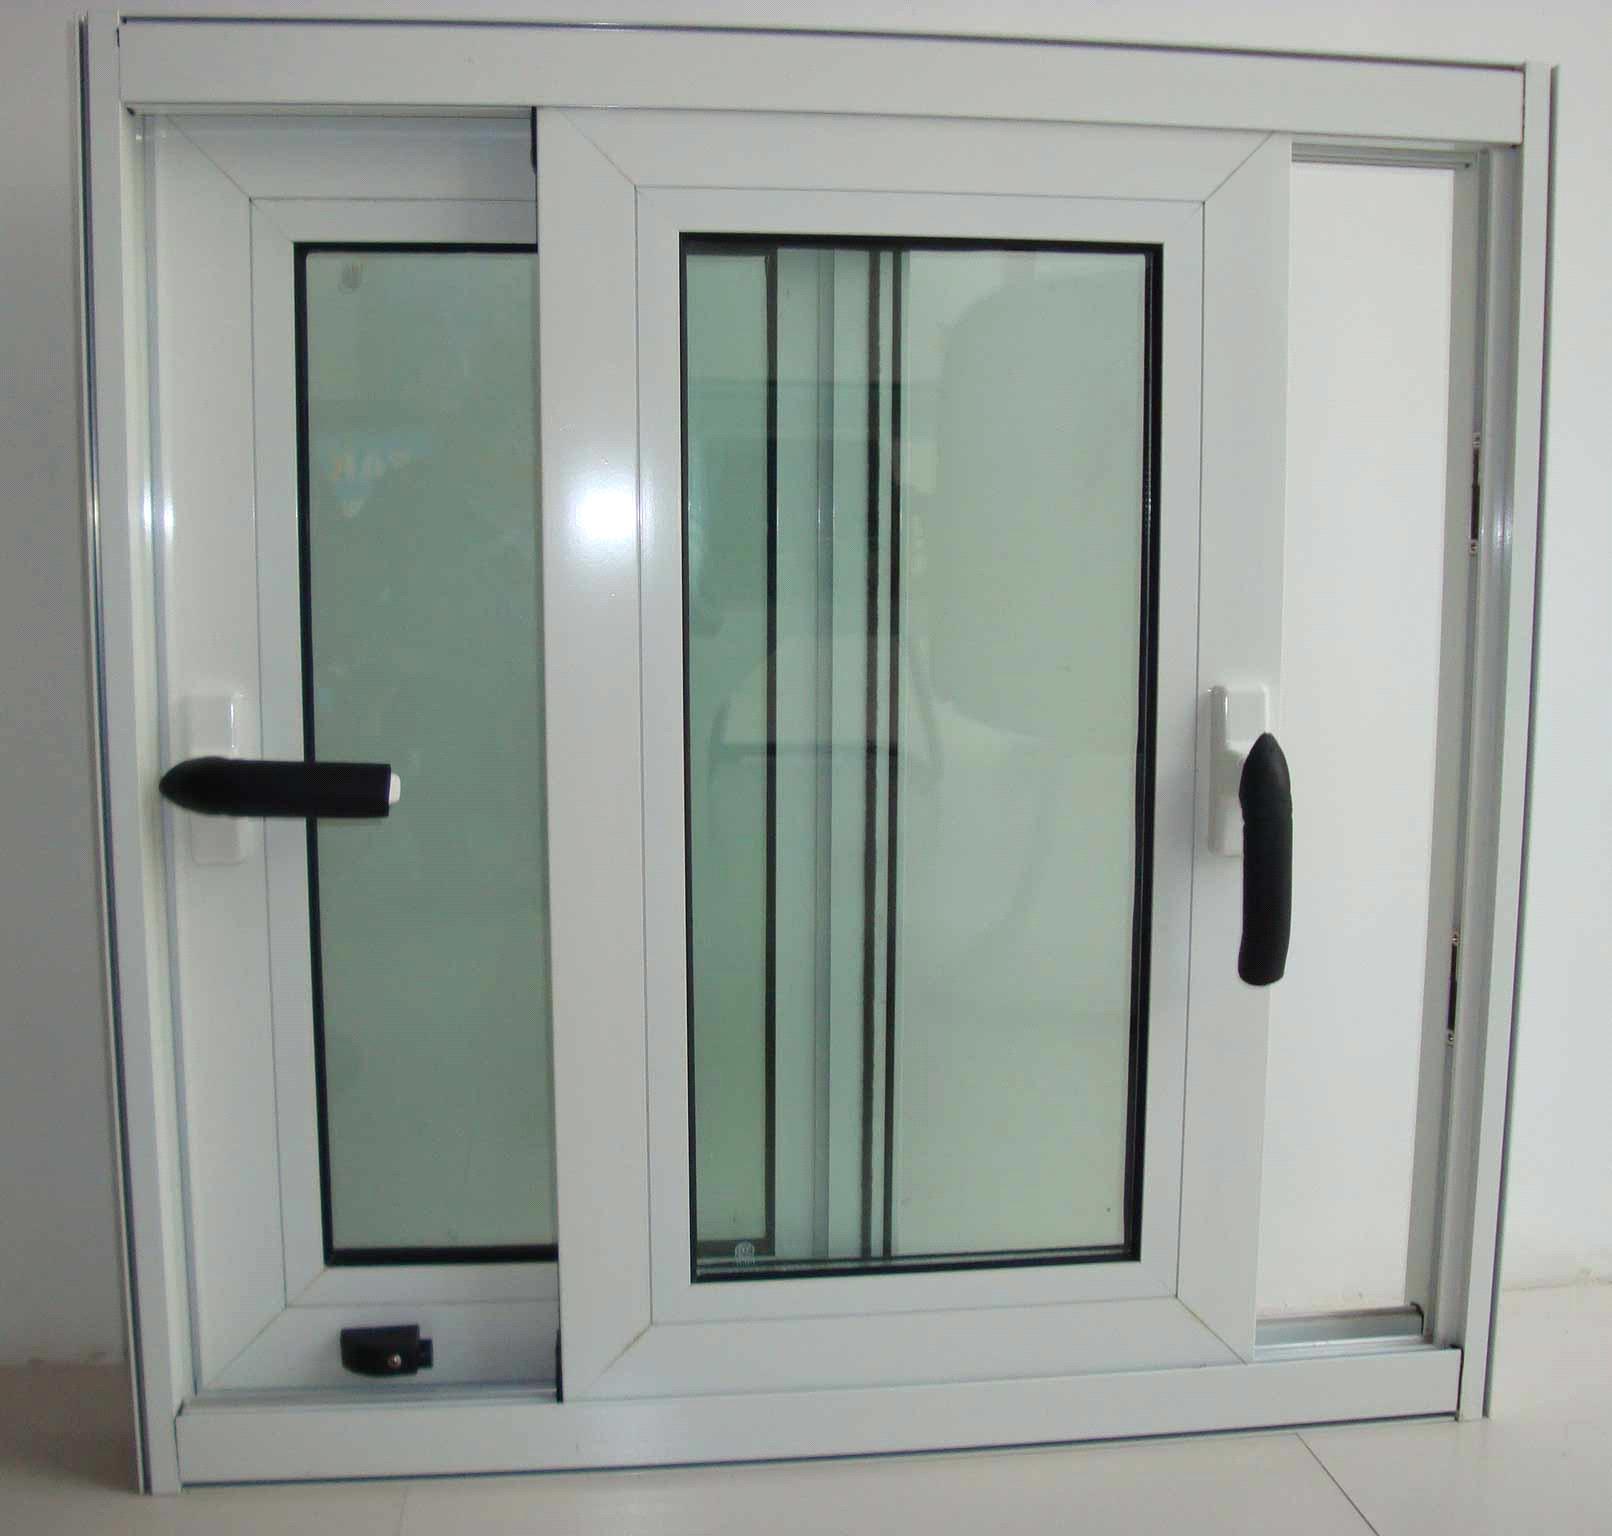 Pvc Window Product : Pvc sliding window purchasing souring agent ecvv